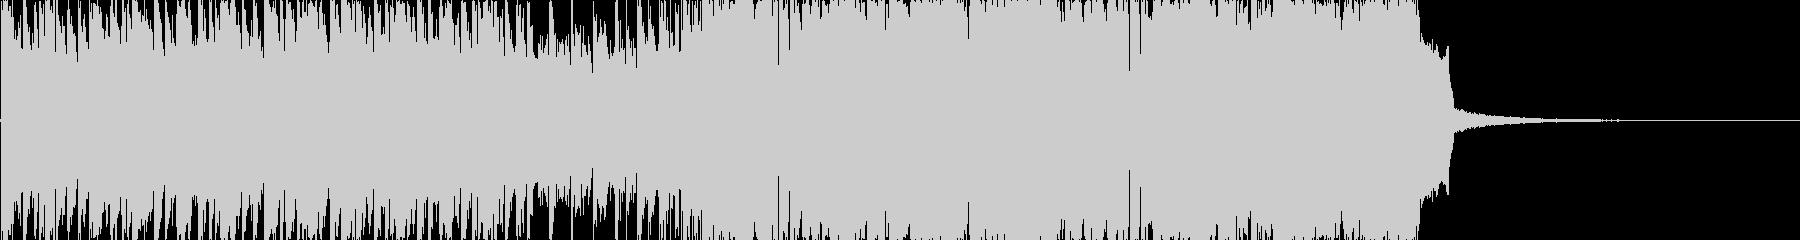 30 seconds of intense dubstep's unreproduced waveform